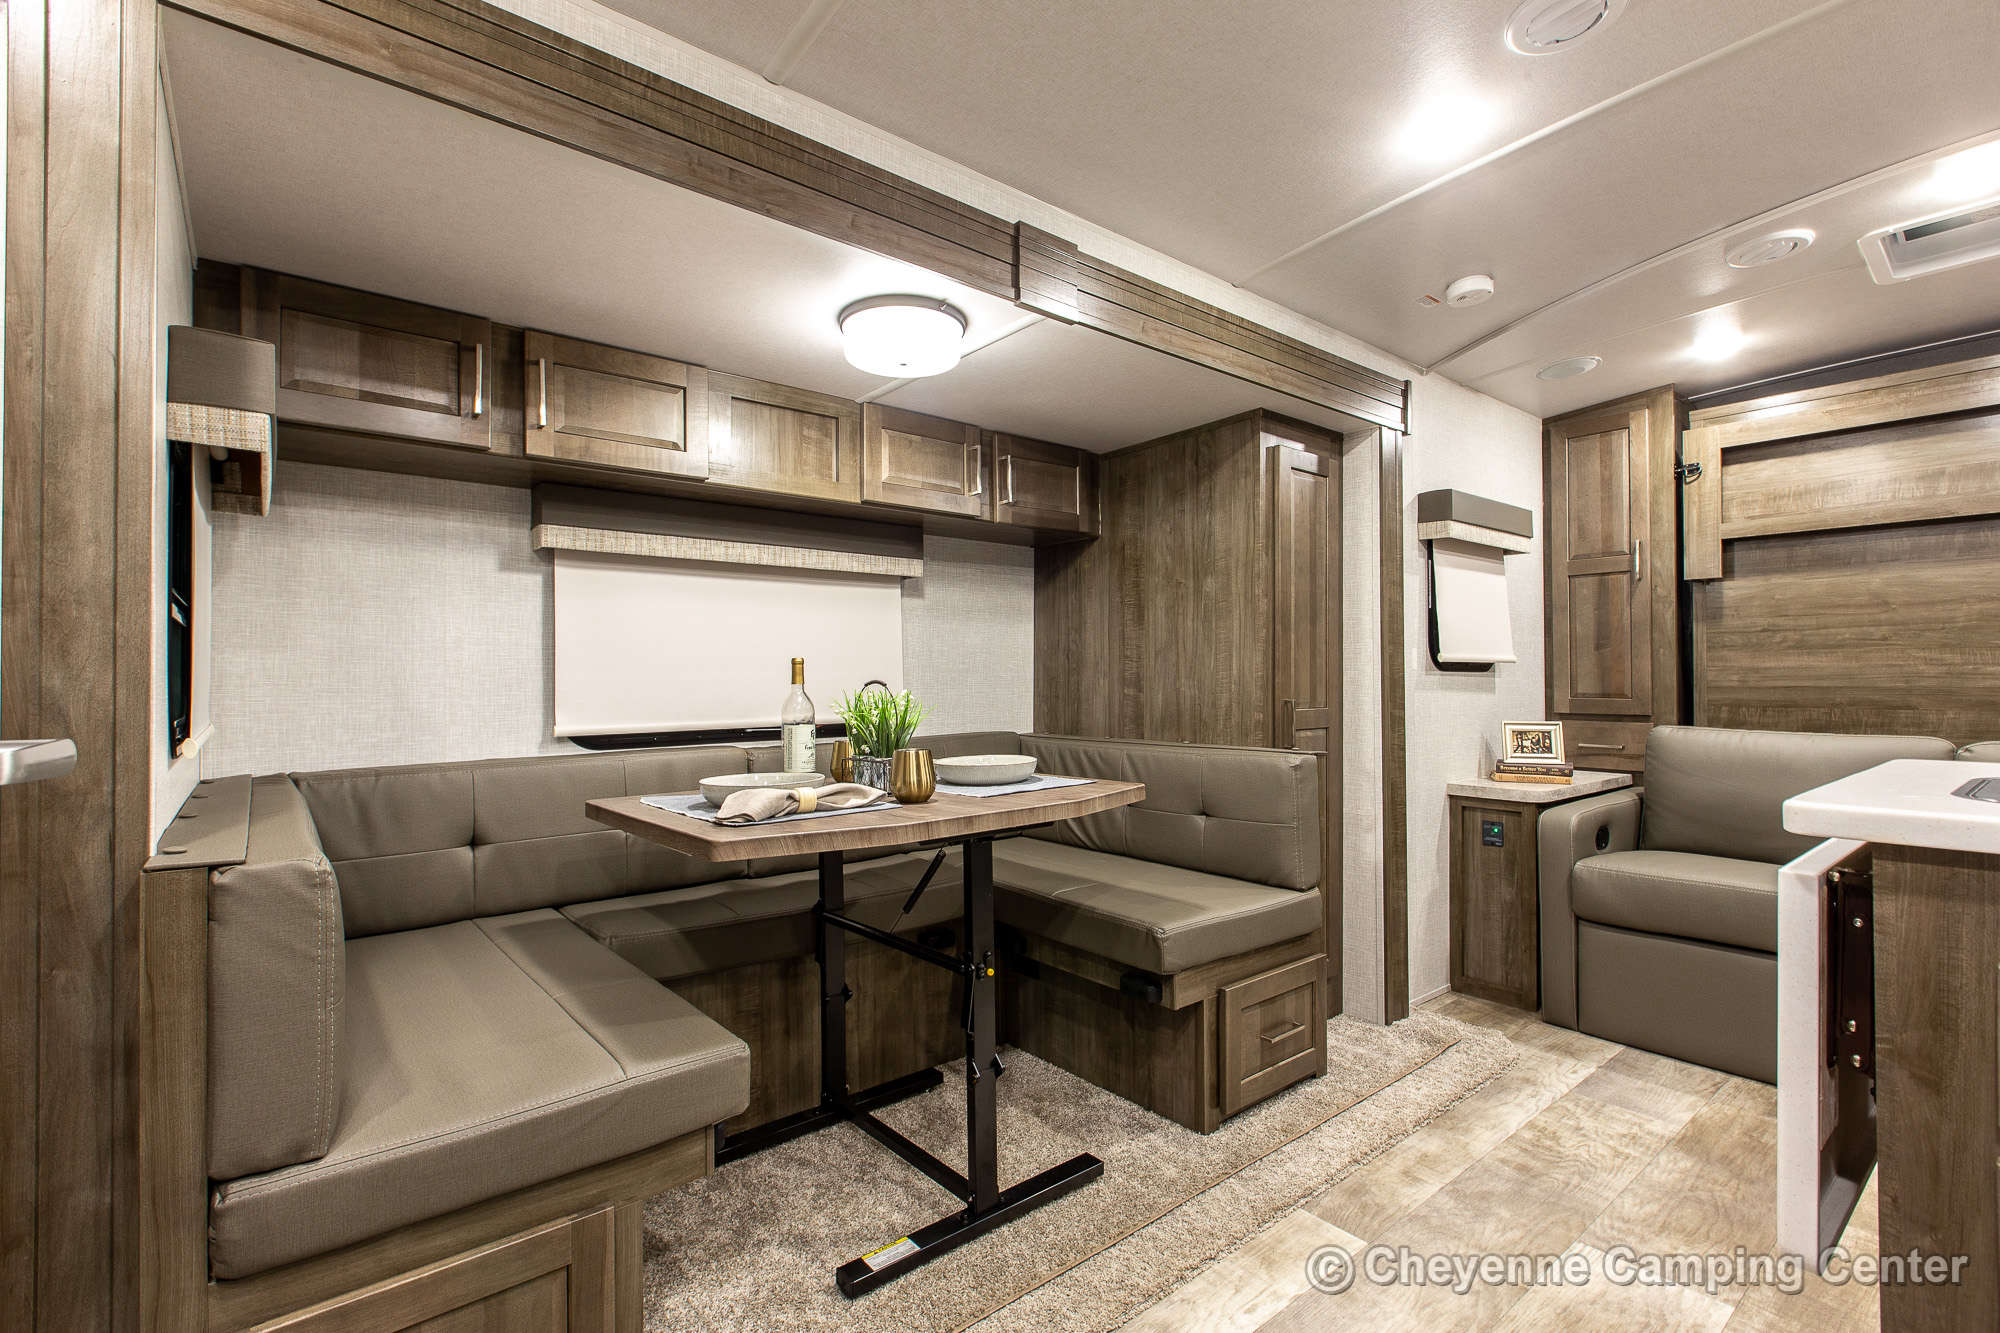 2021 Forest River Flagstaff Micro Lite 21DS Travel Trailer Interior Image